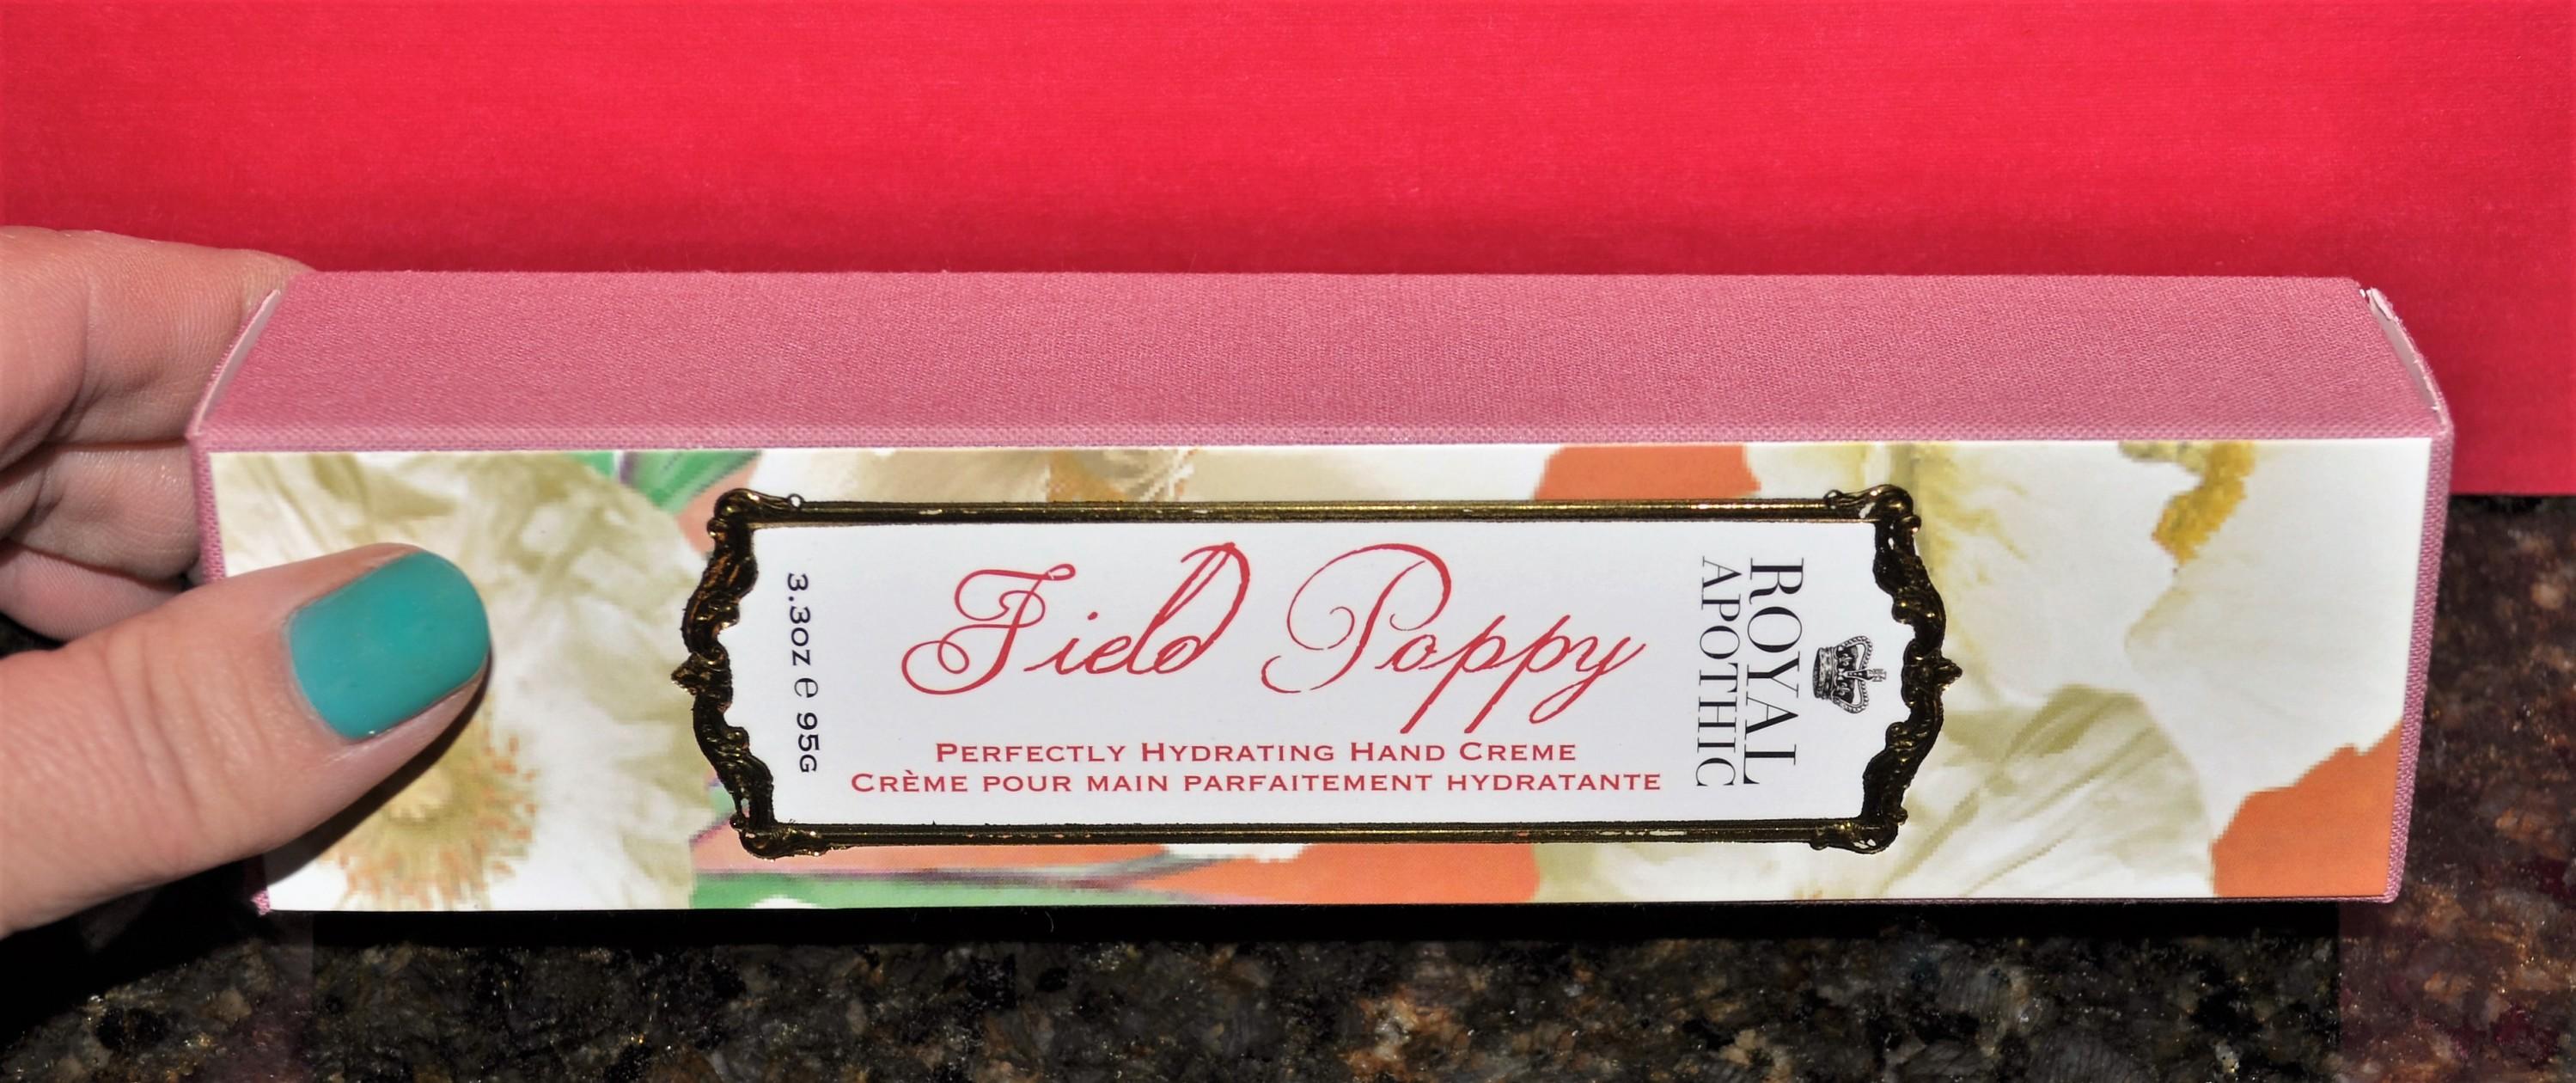 Popsugar Field Poppy Creme Box